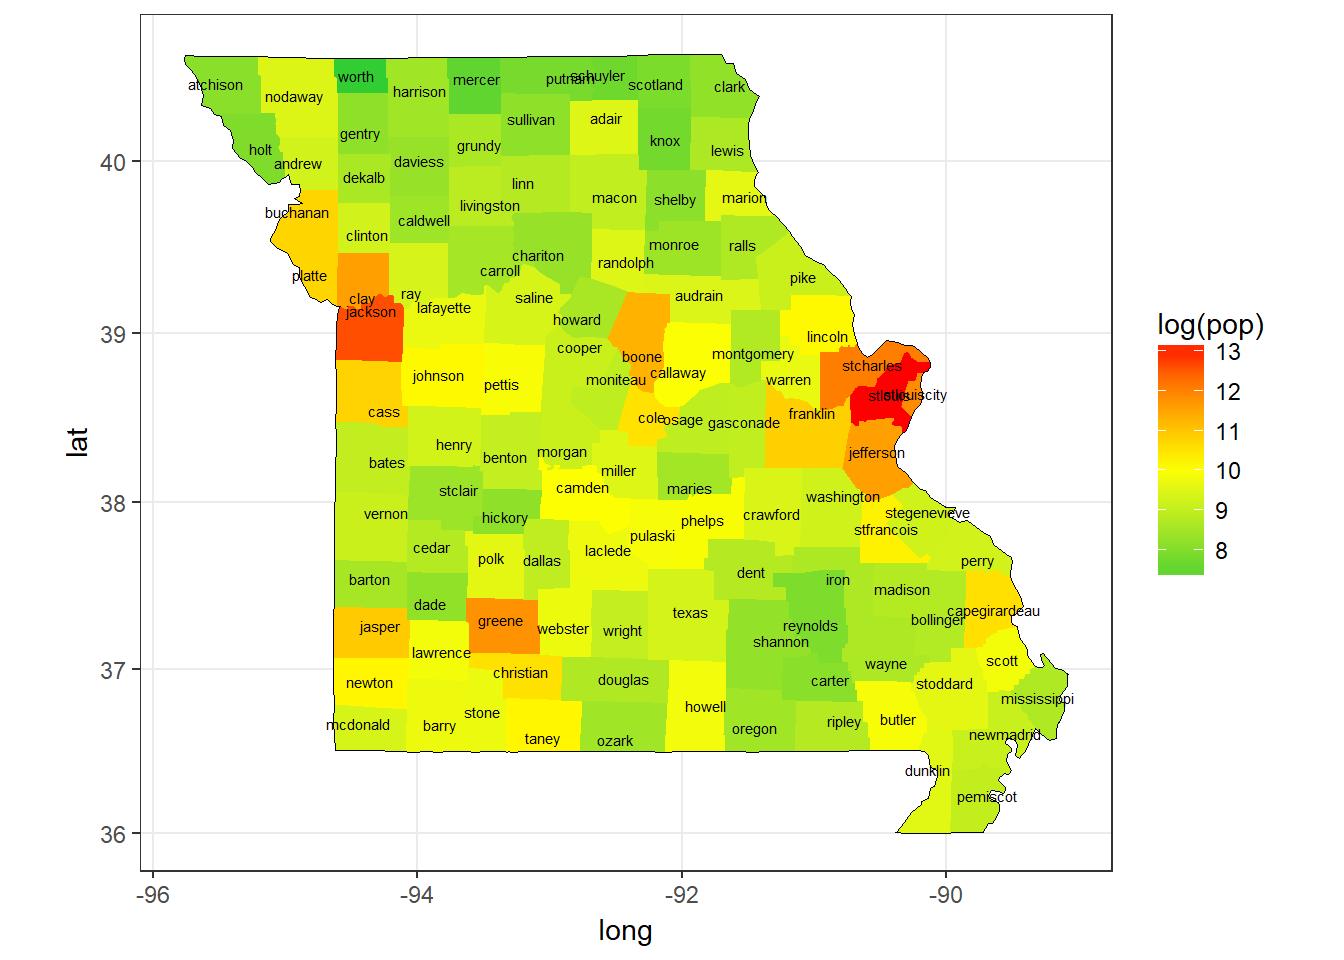 Missouri Population (Log) by County, 2009